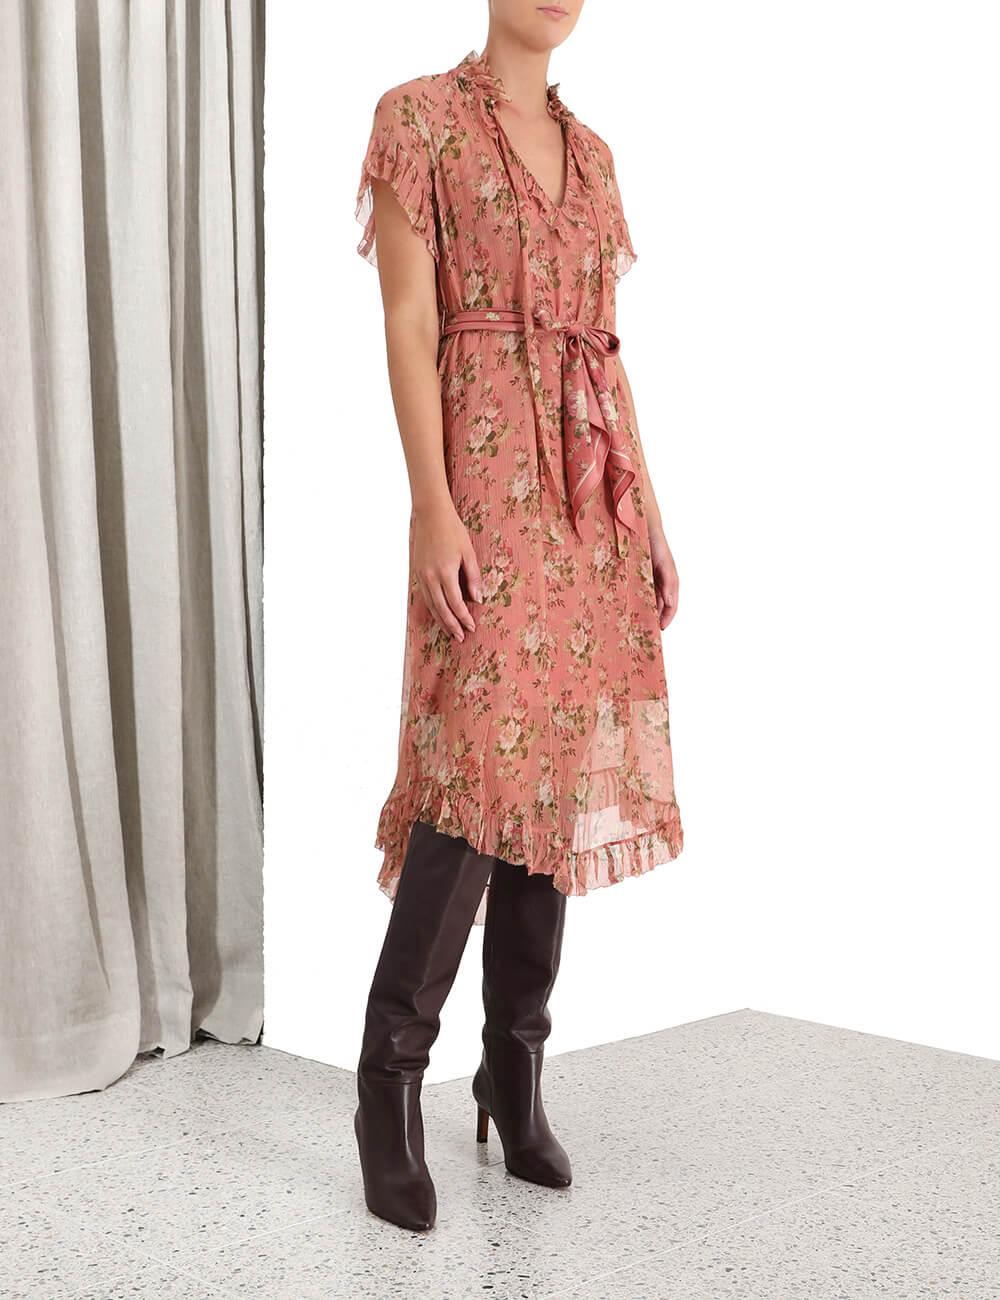 Espionage Frilled Dress